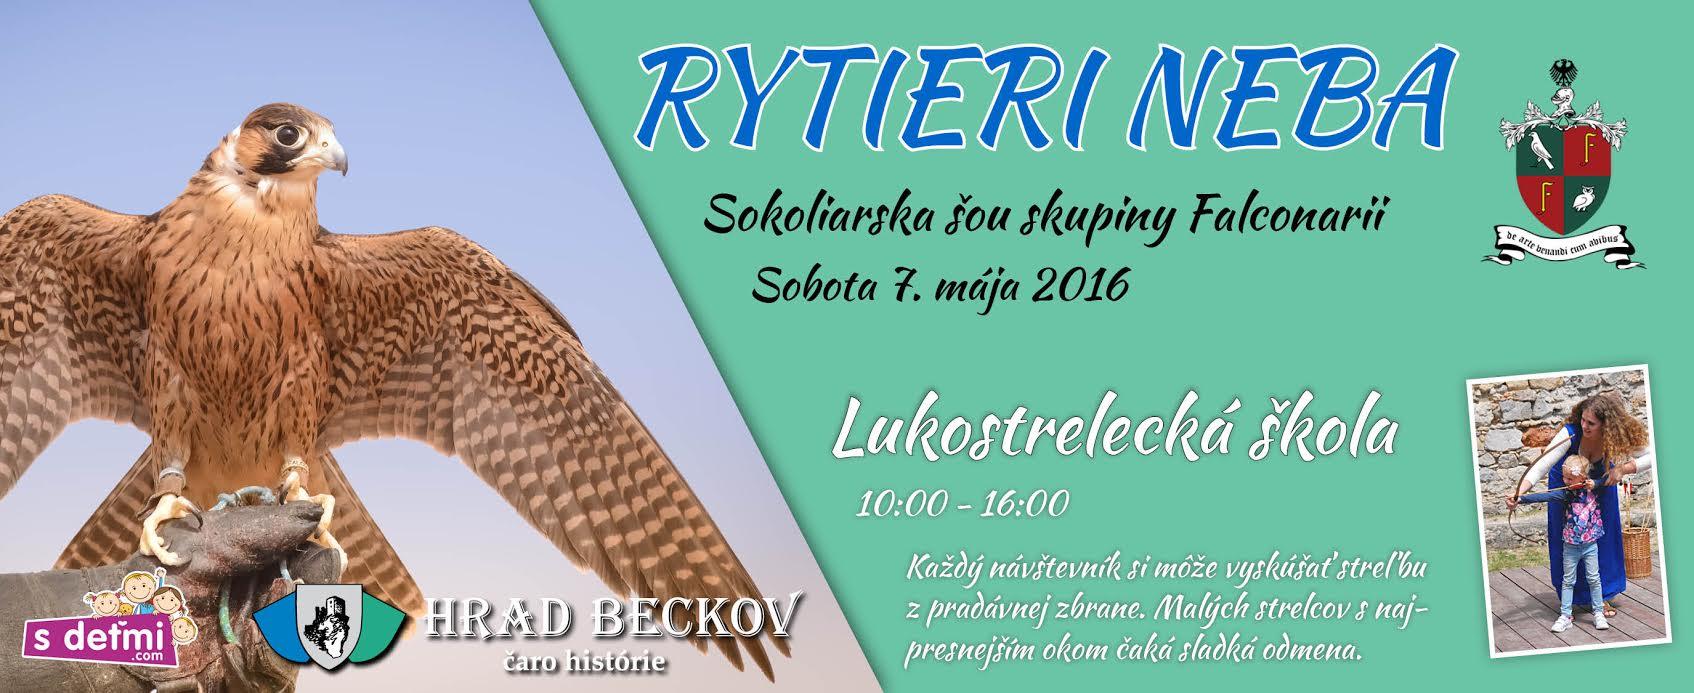 Banner_Rytieri neba_Luk skola